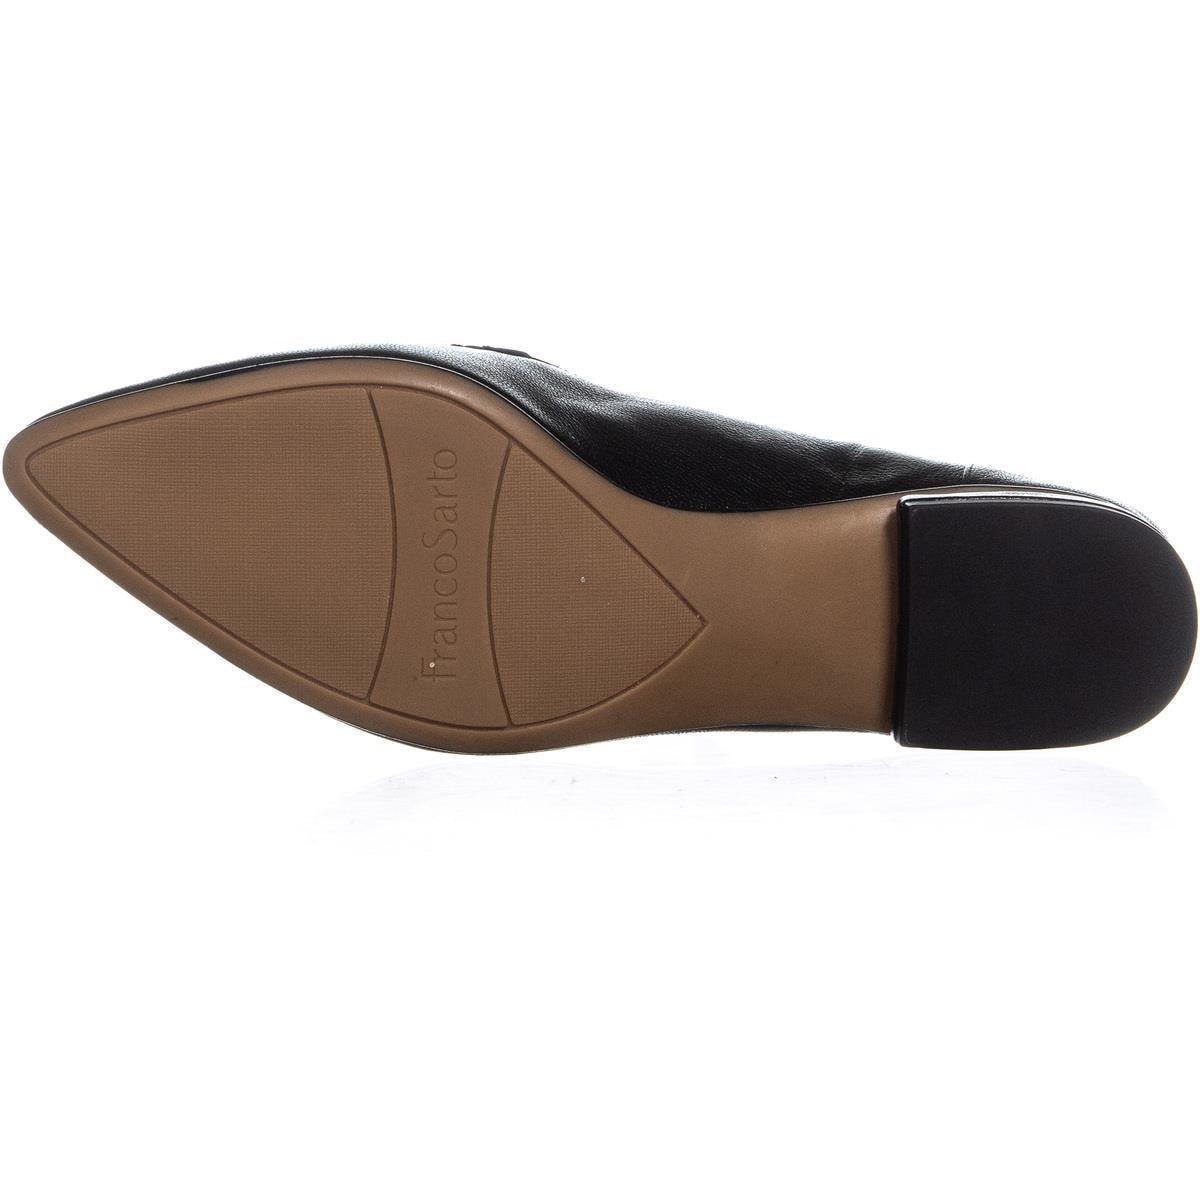 987895a2490 Shop Franco Sarto Starland Pointed Toe Ballet Flats